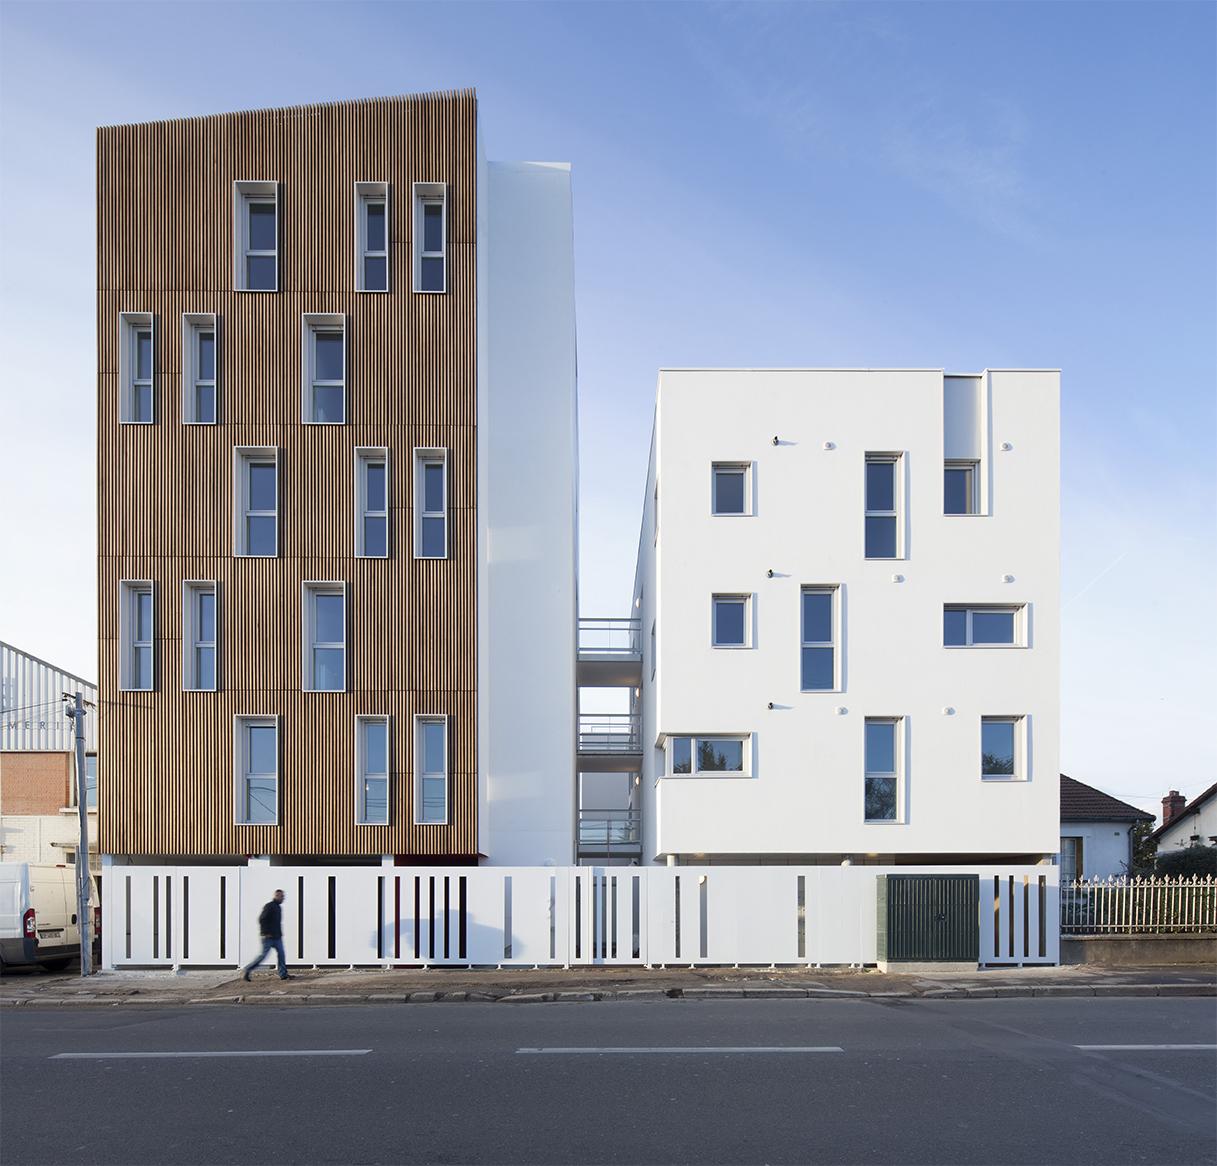 16 social housing units arcdog for Da architecture